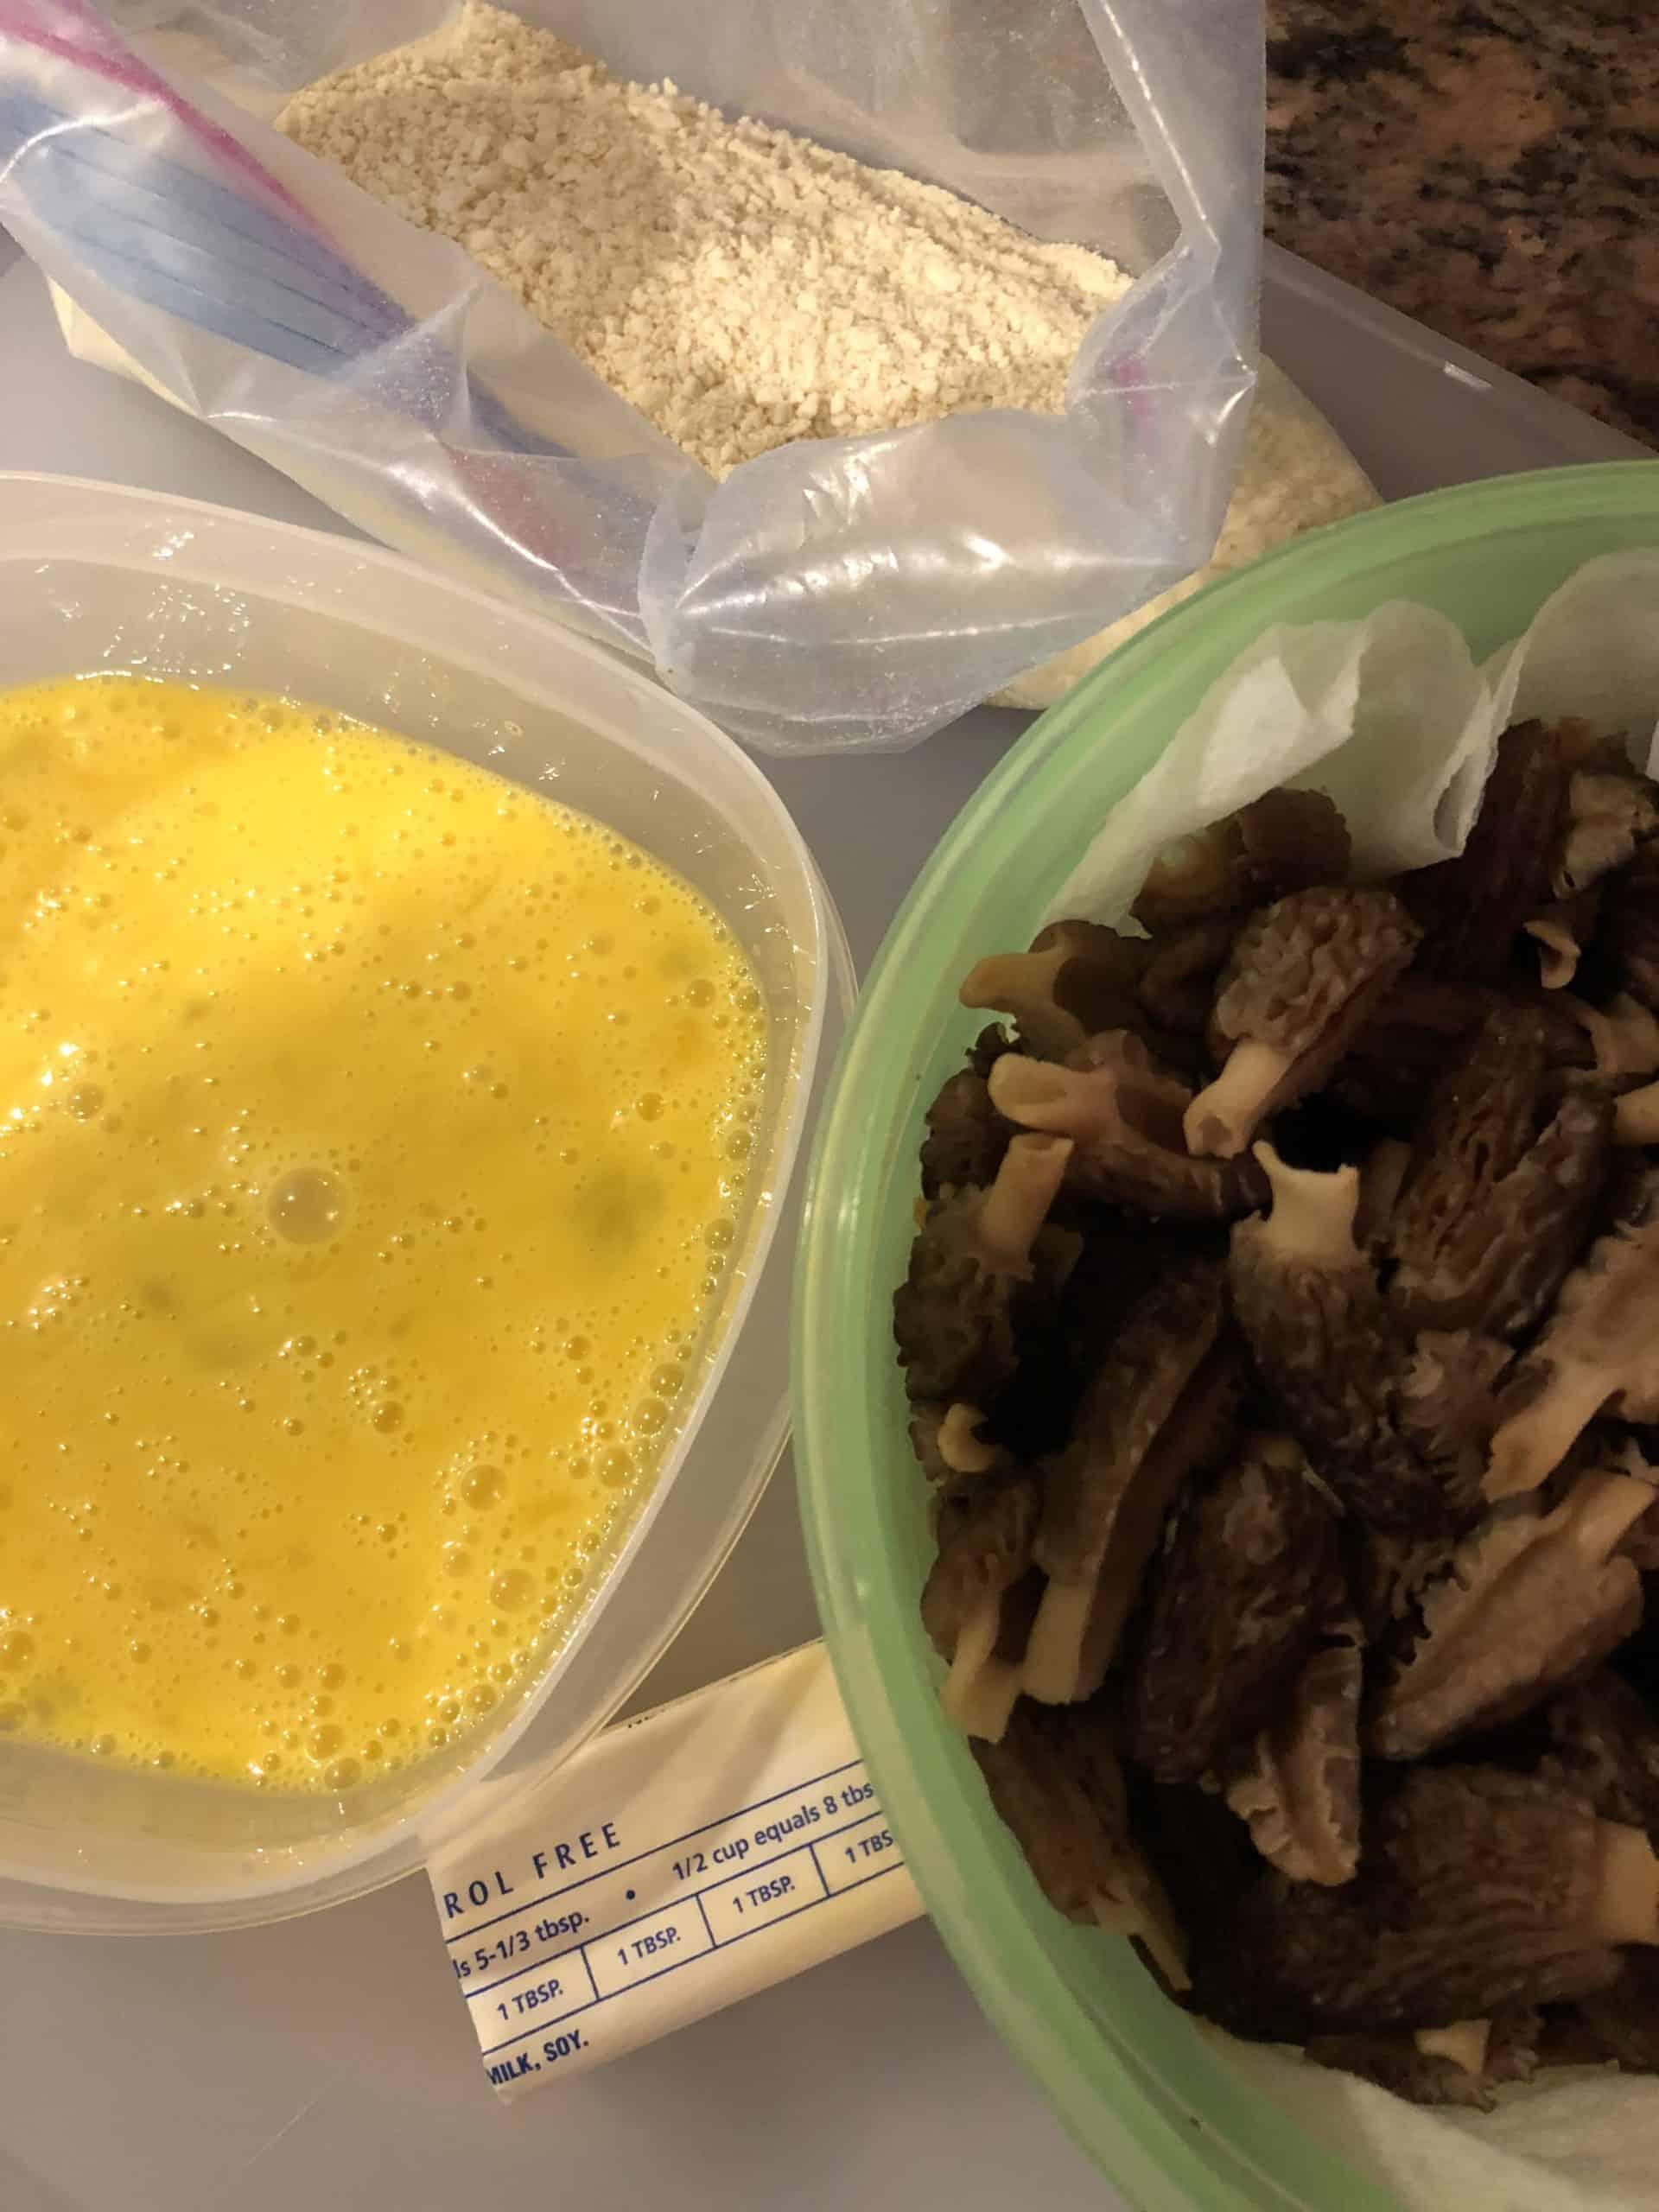 Pan Fried Morel Mushrooms Ingredients